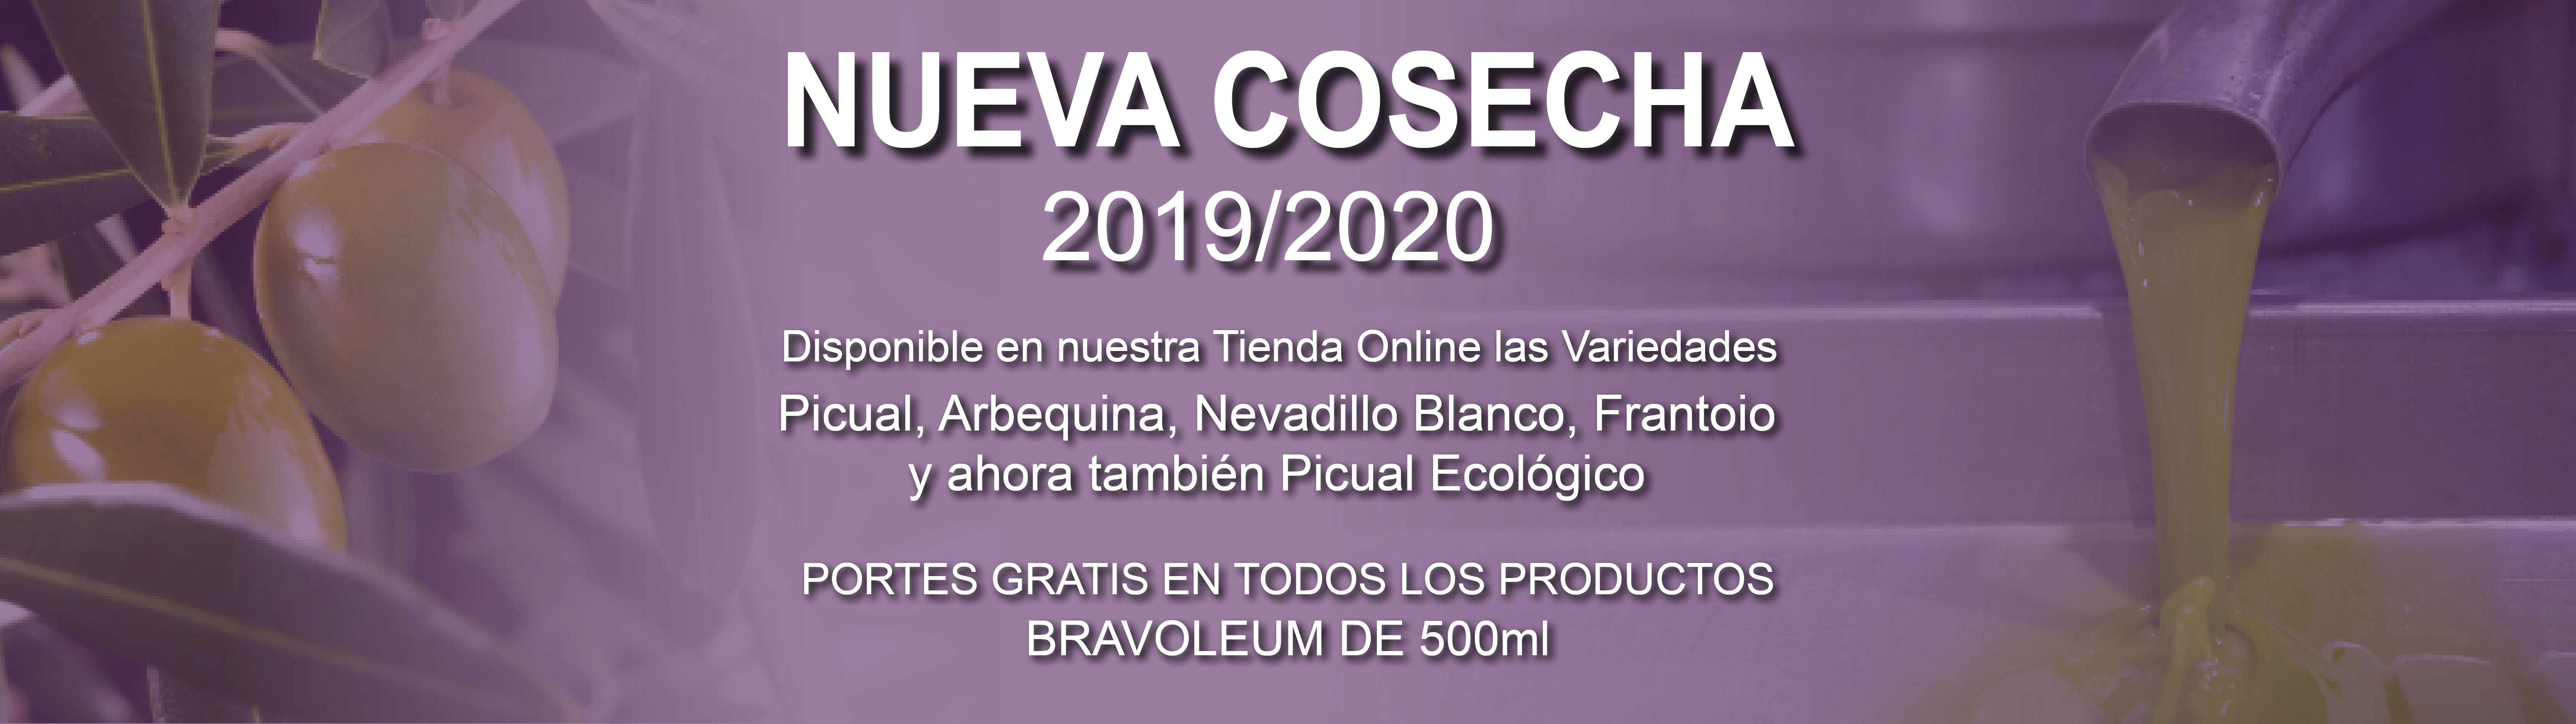 Nueva Cosecha 2019/2020 bravoleum